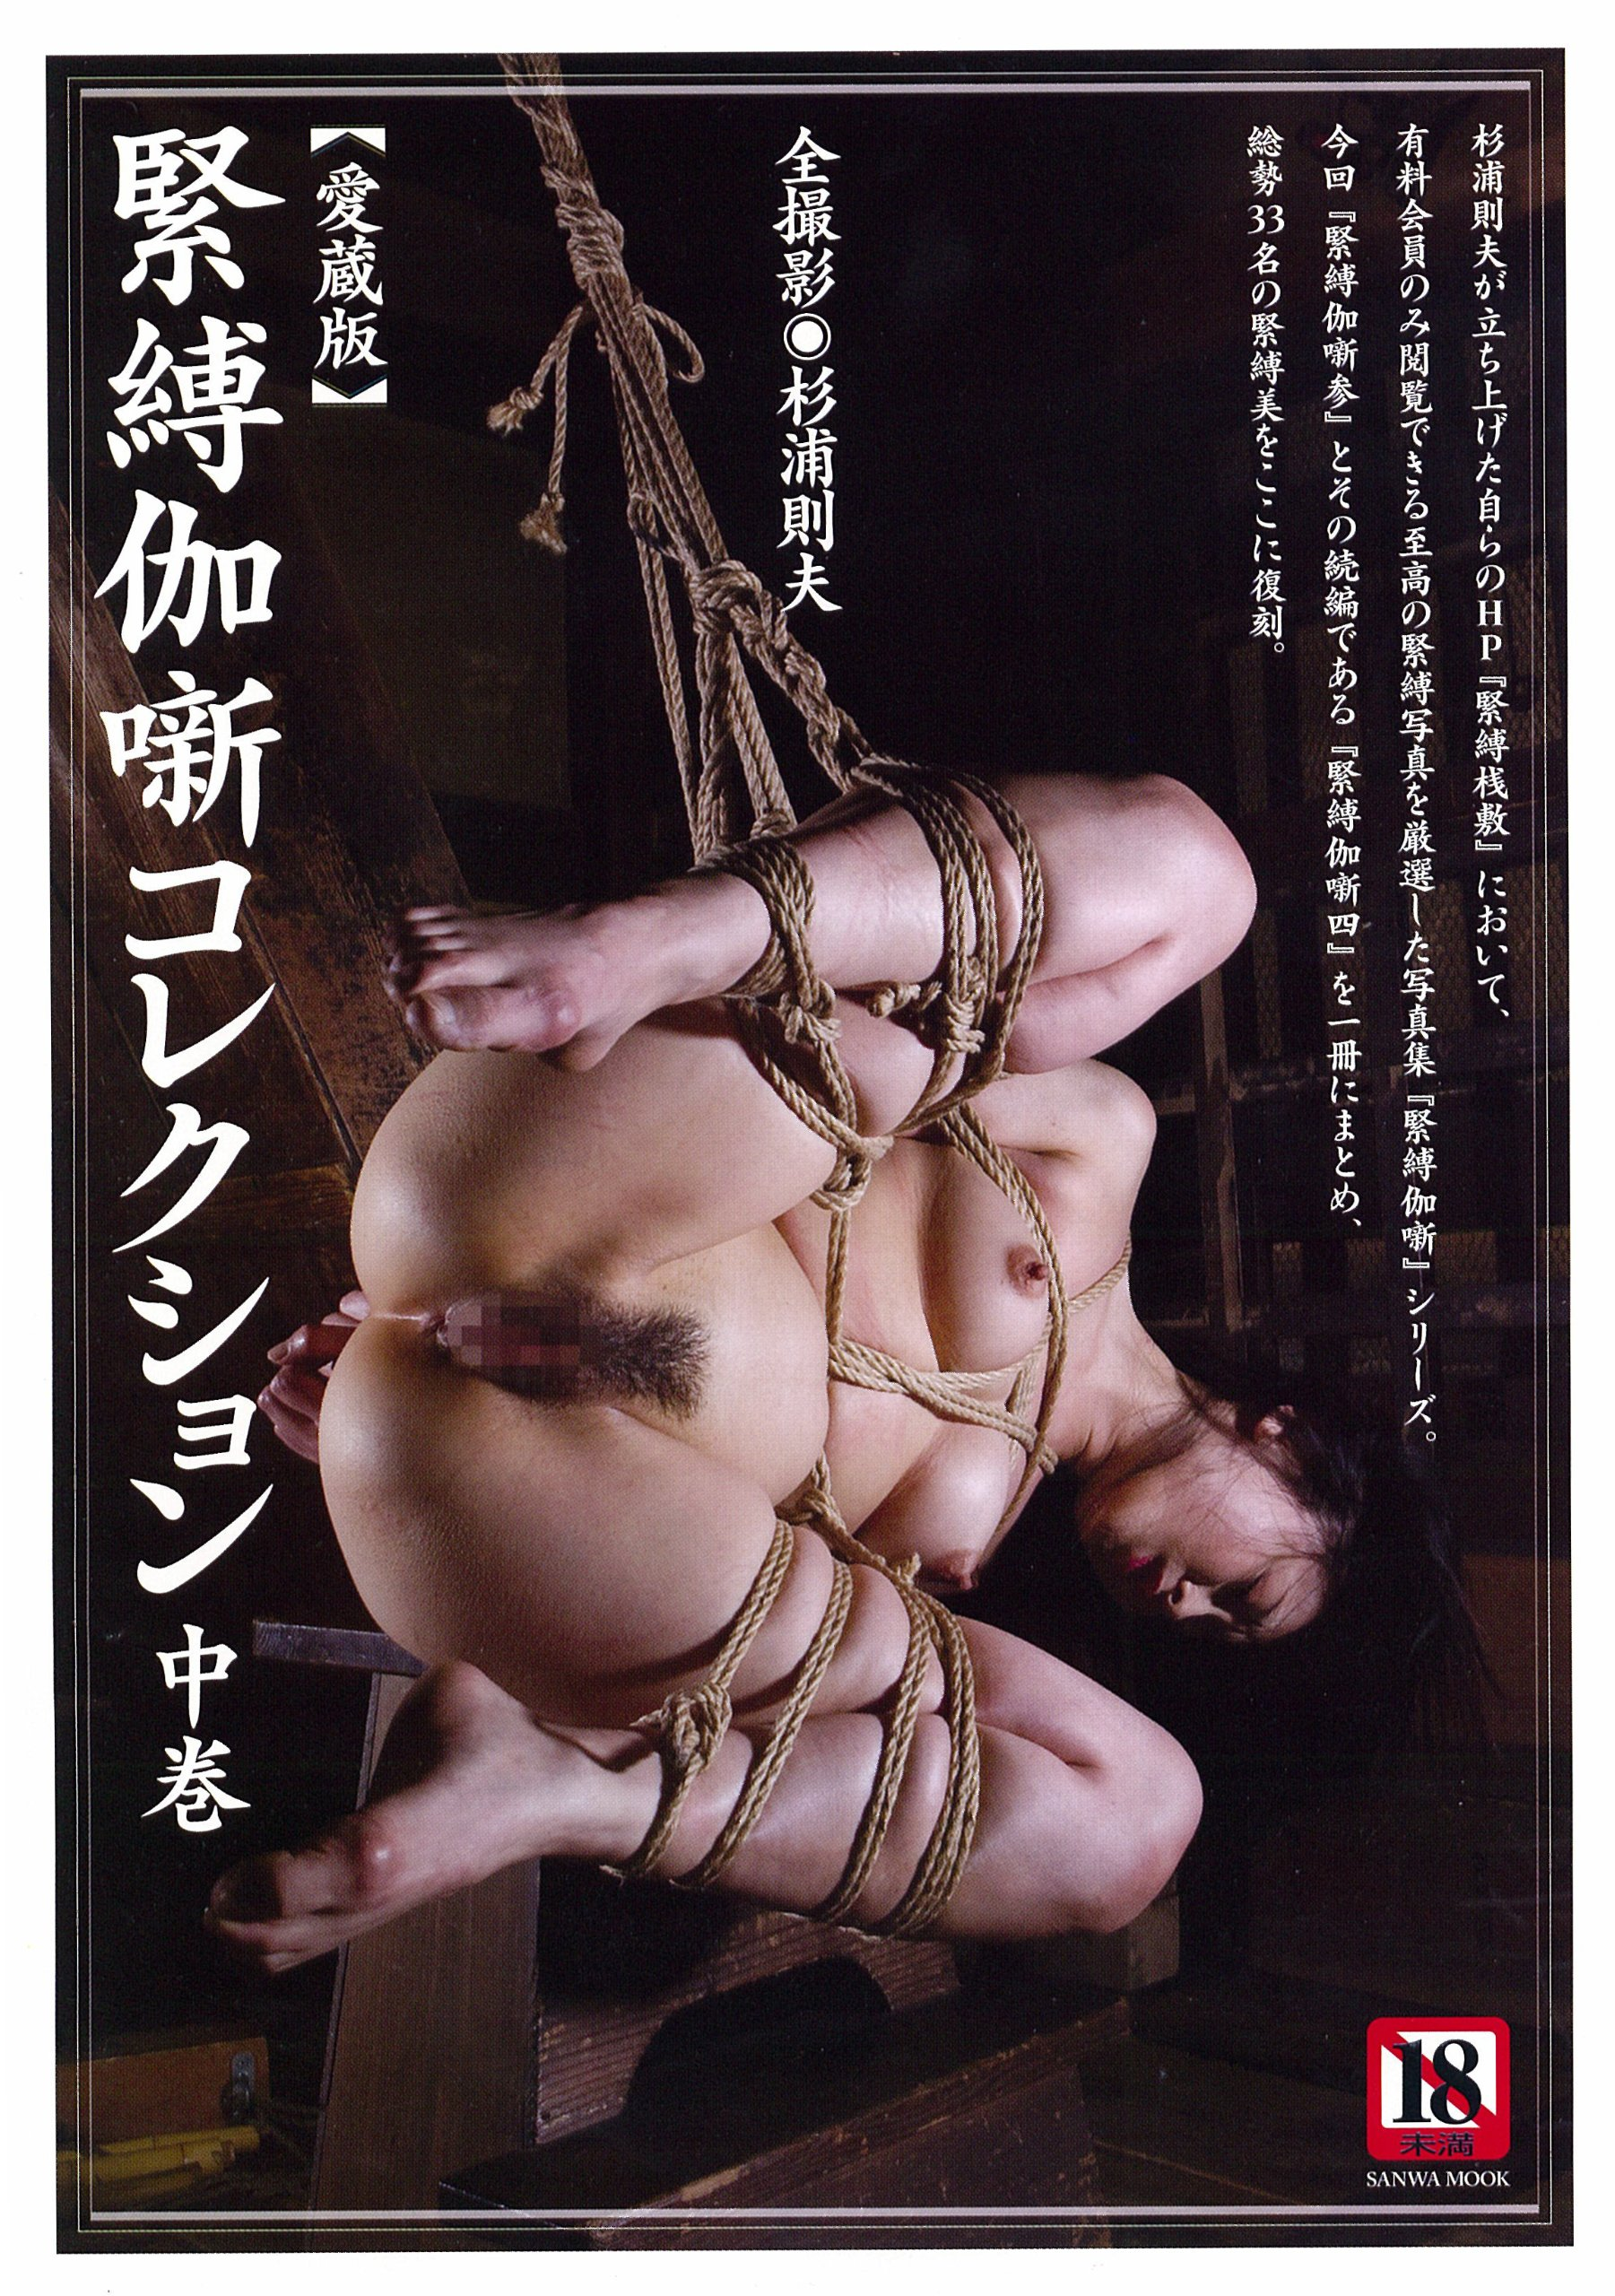 Erotic nymph art